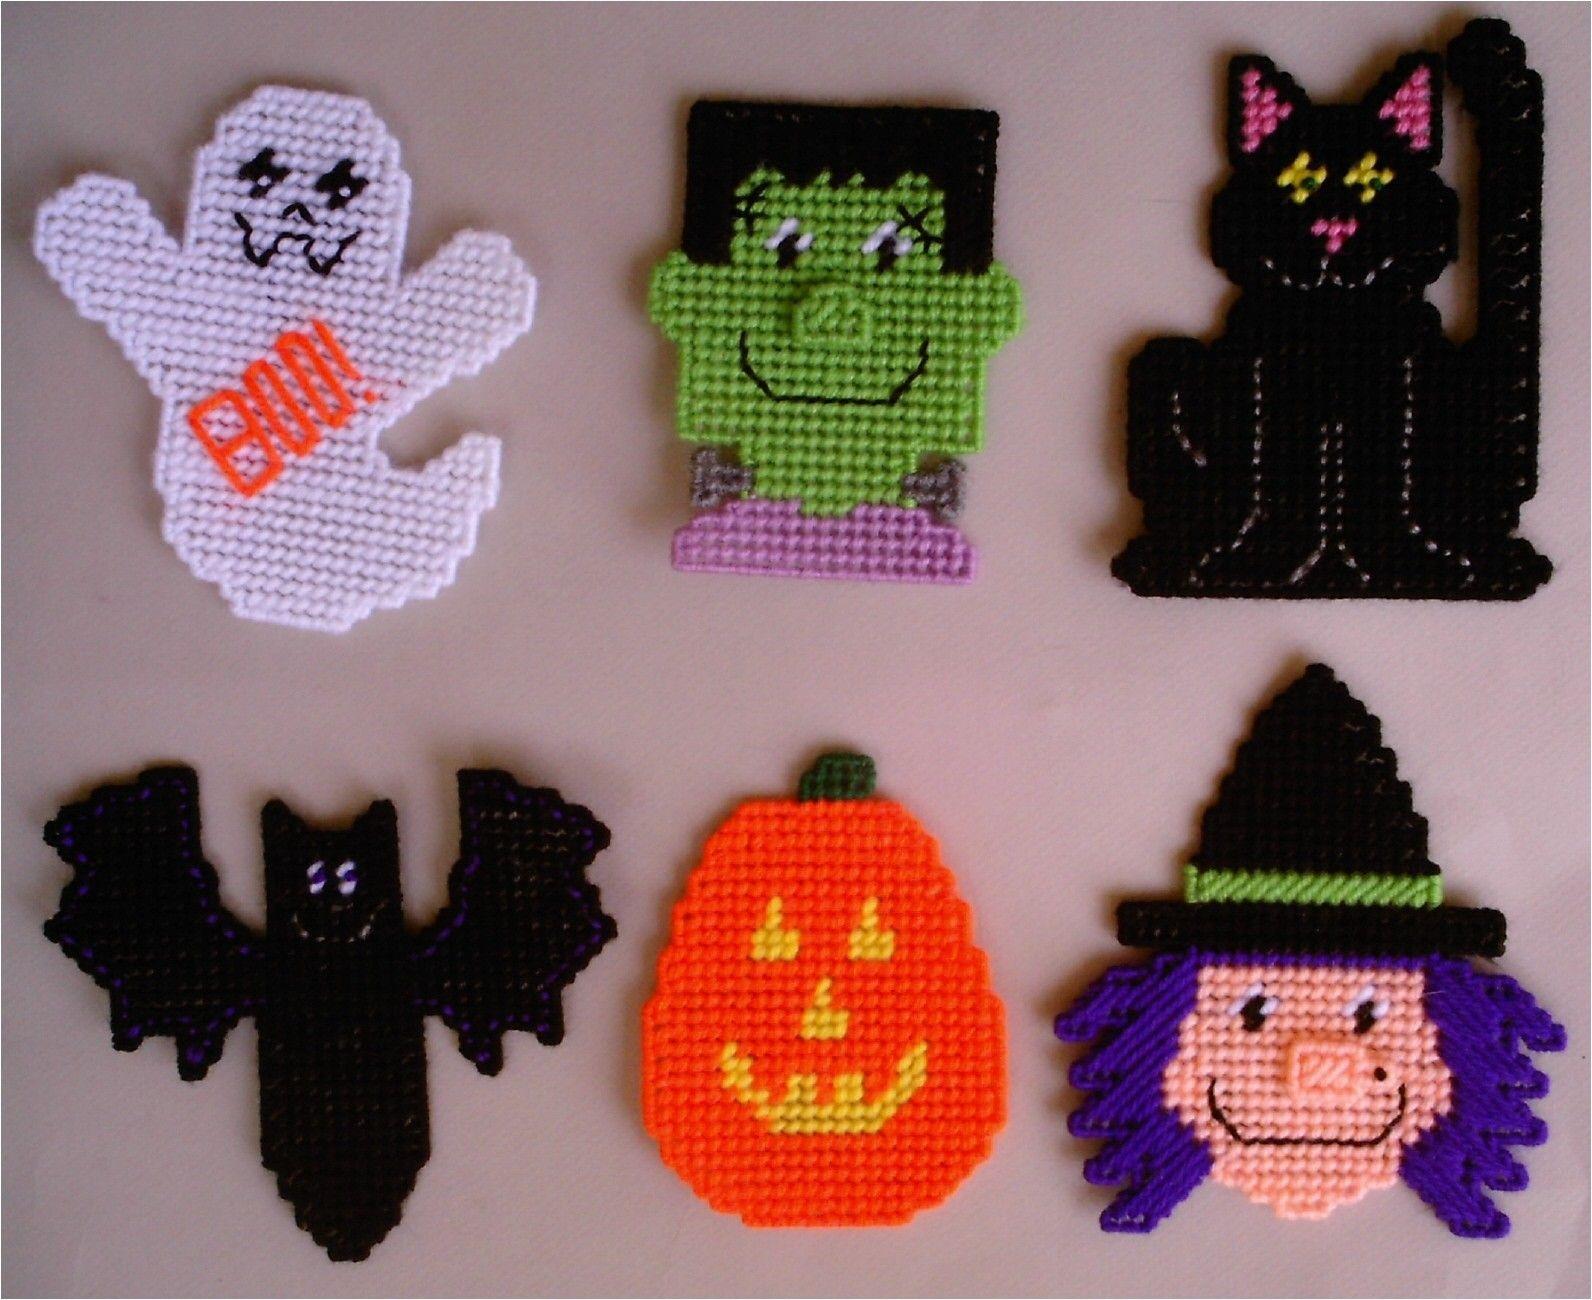 Free Plastic Canvas Magnet Patterns | Plastic Canvas-Halloween - Printable Plastic Canvas Patterns Free Online